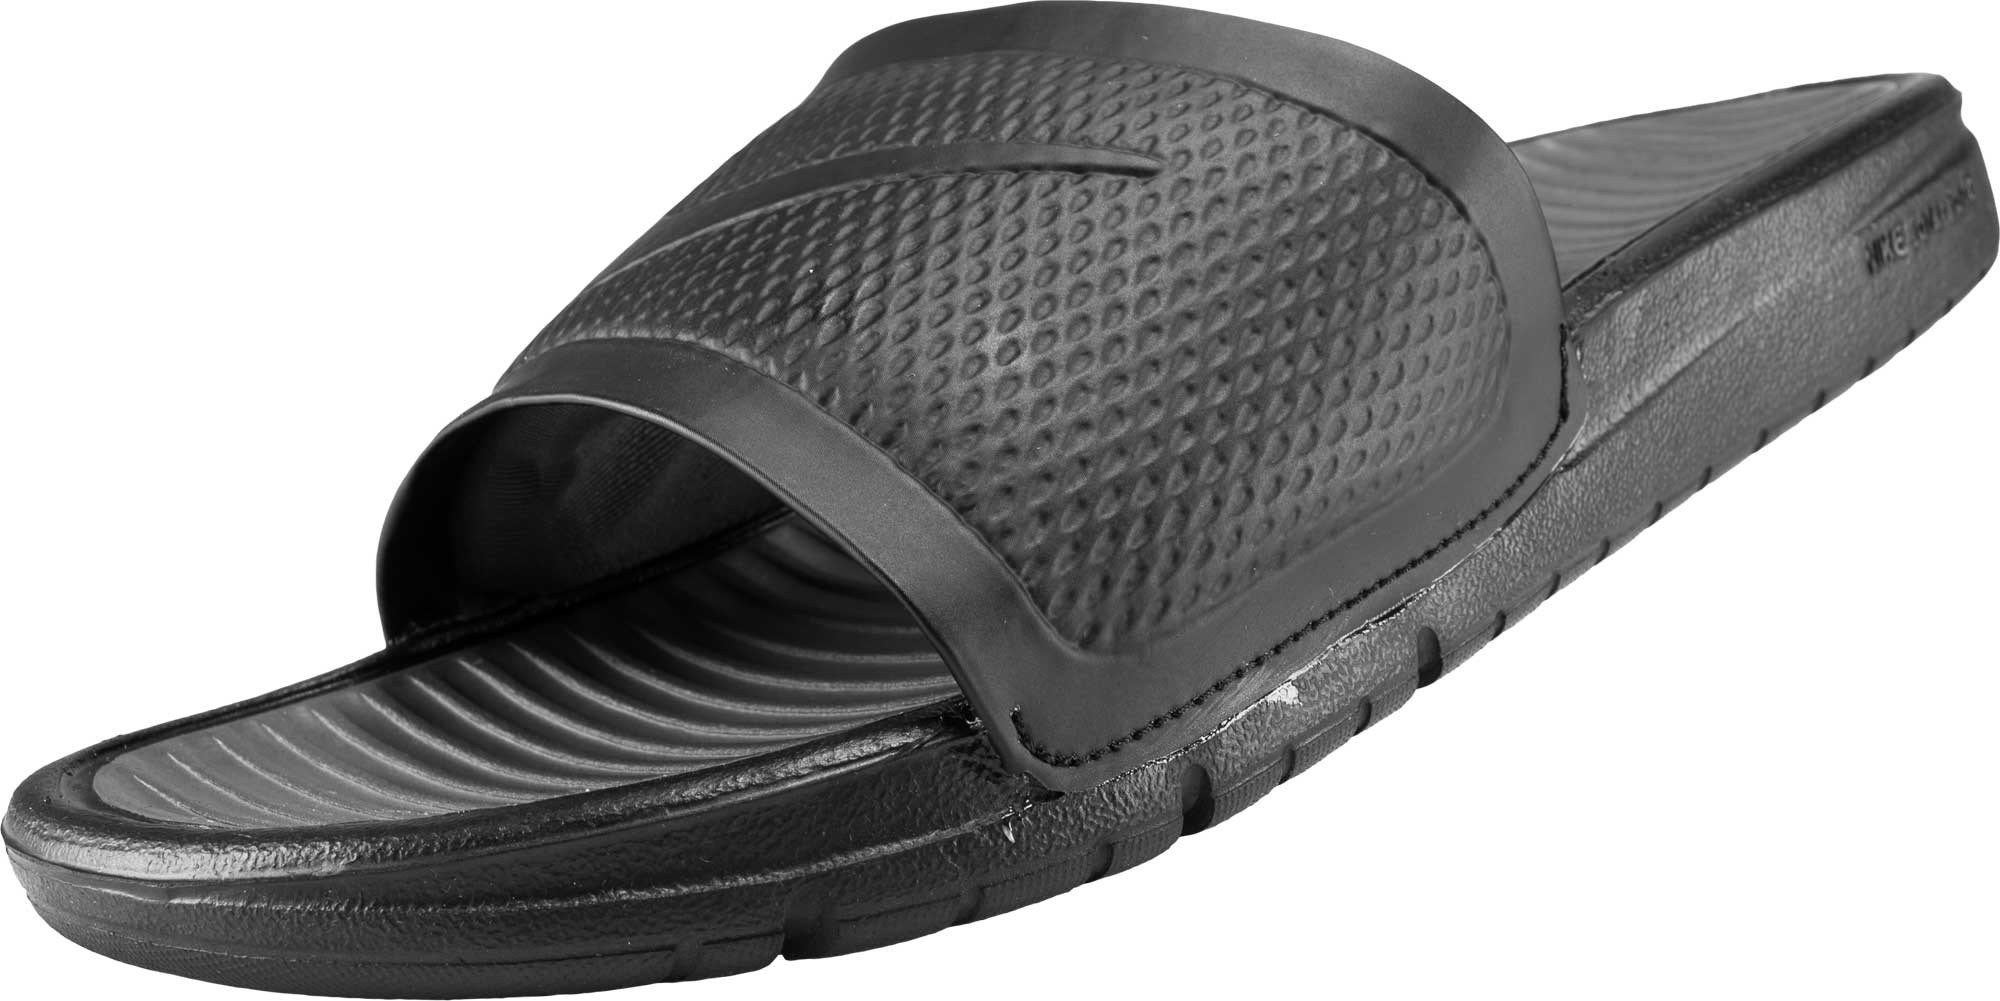 Nike Benassi Solarsoft Slide - Black - Soccer Master f068a2008d98